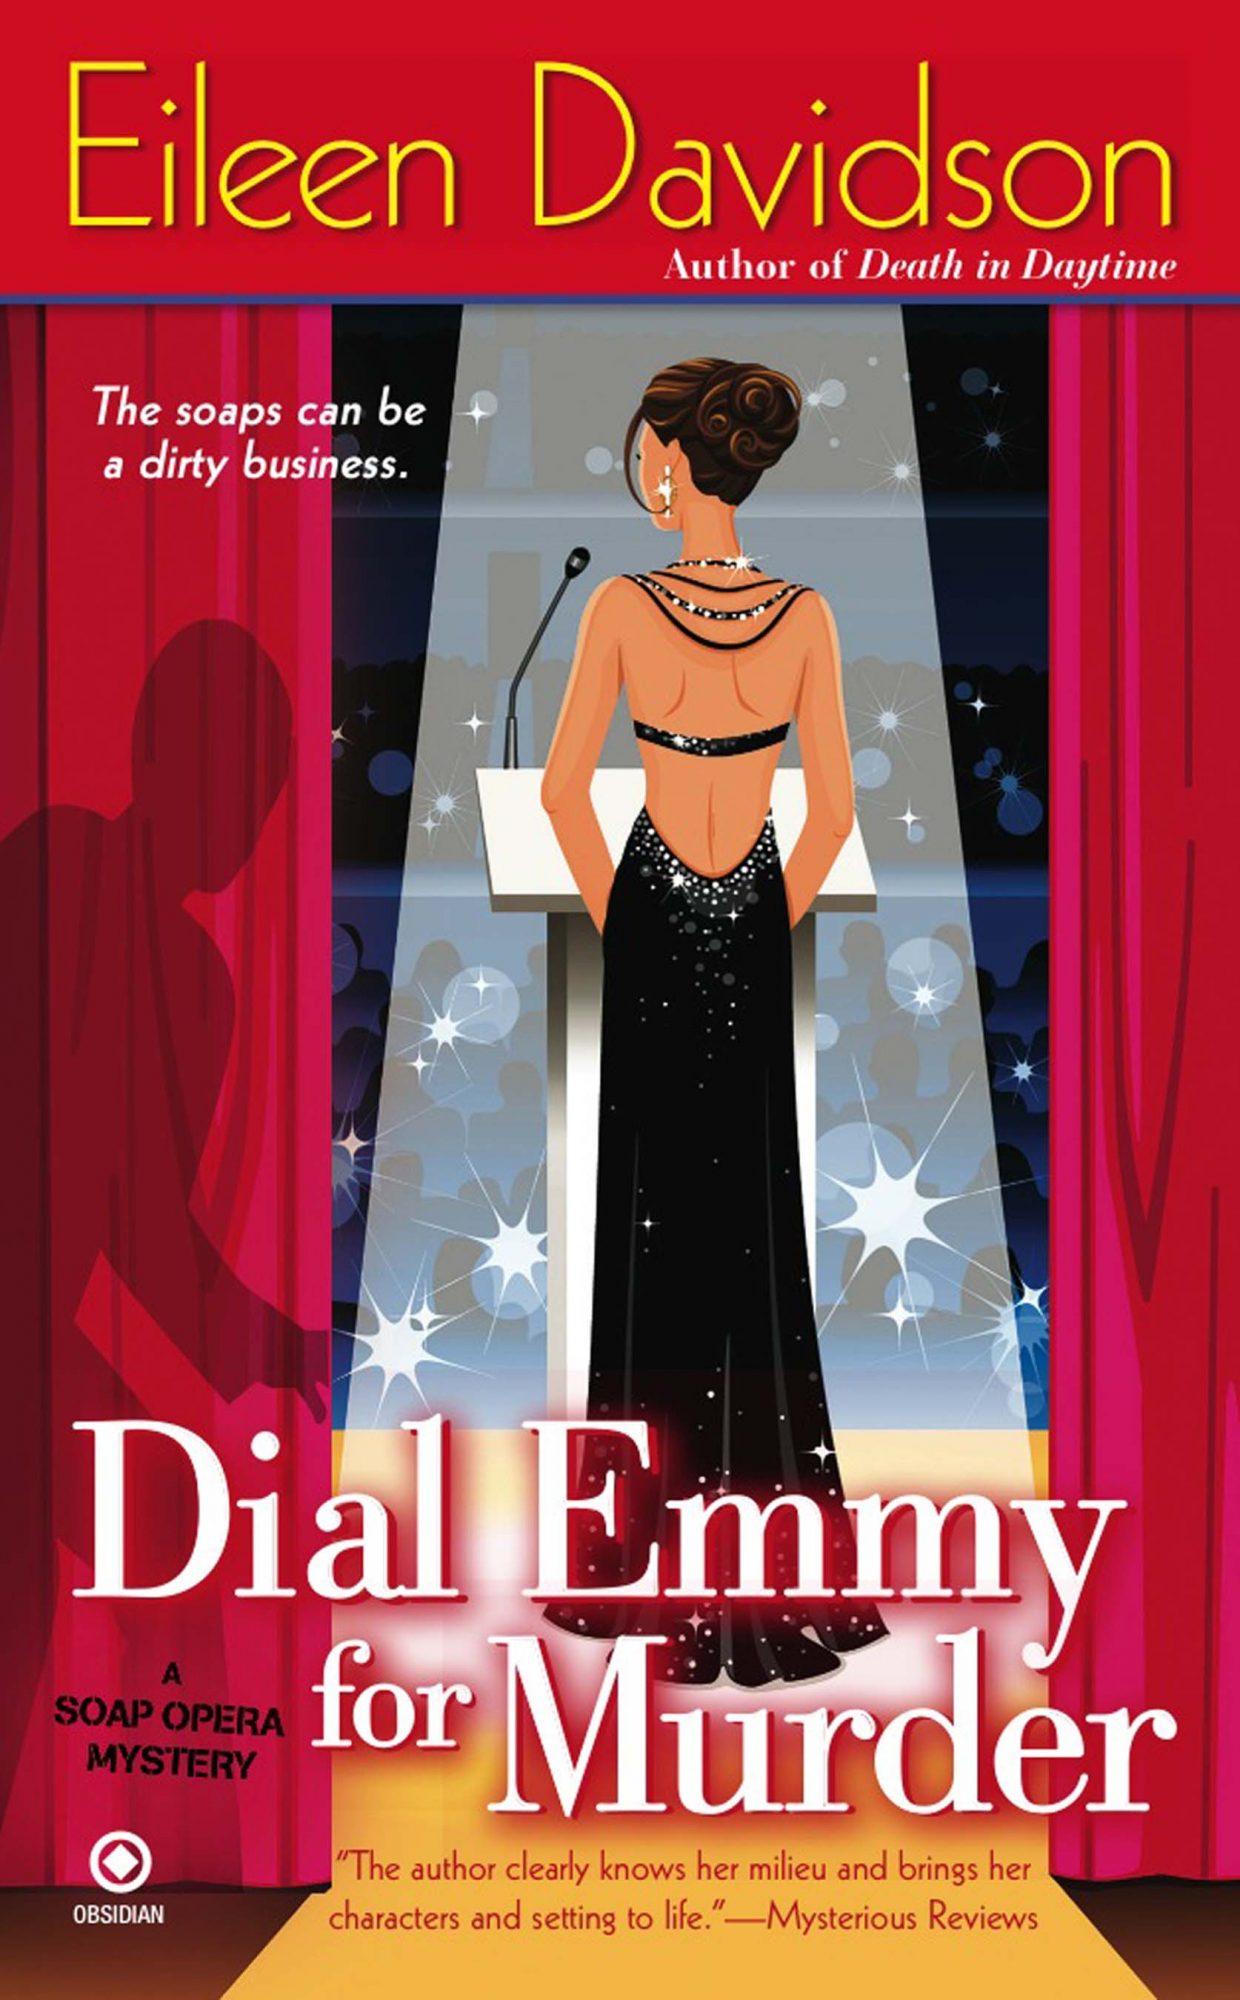 Dial Emmy For MurderA SOAP OPERA MYSTERYBy EILEEN DAVIDSONSignet